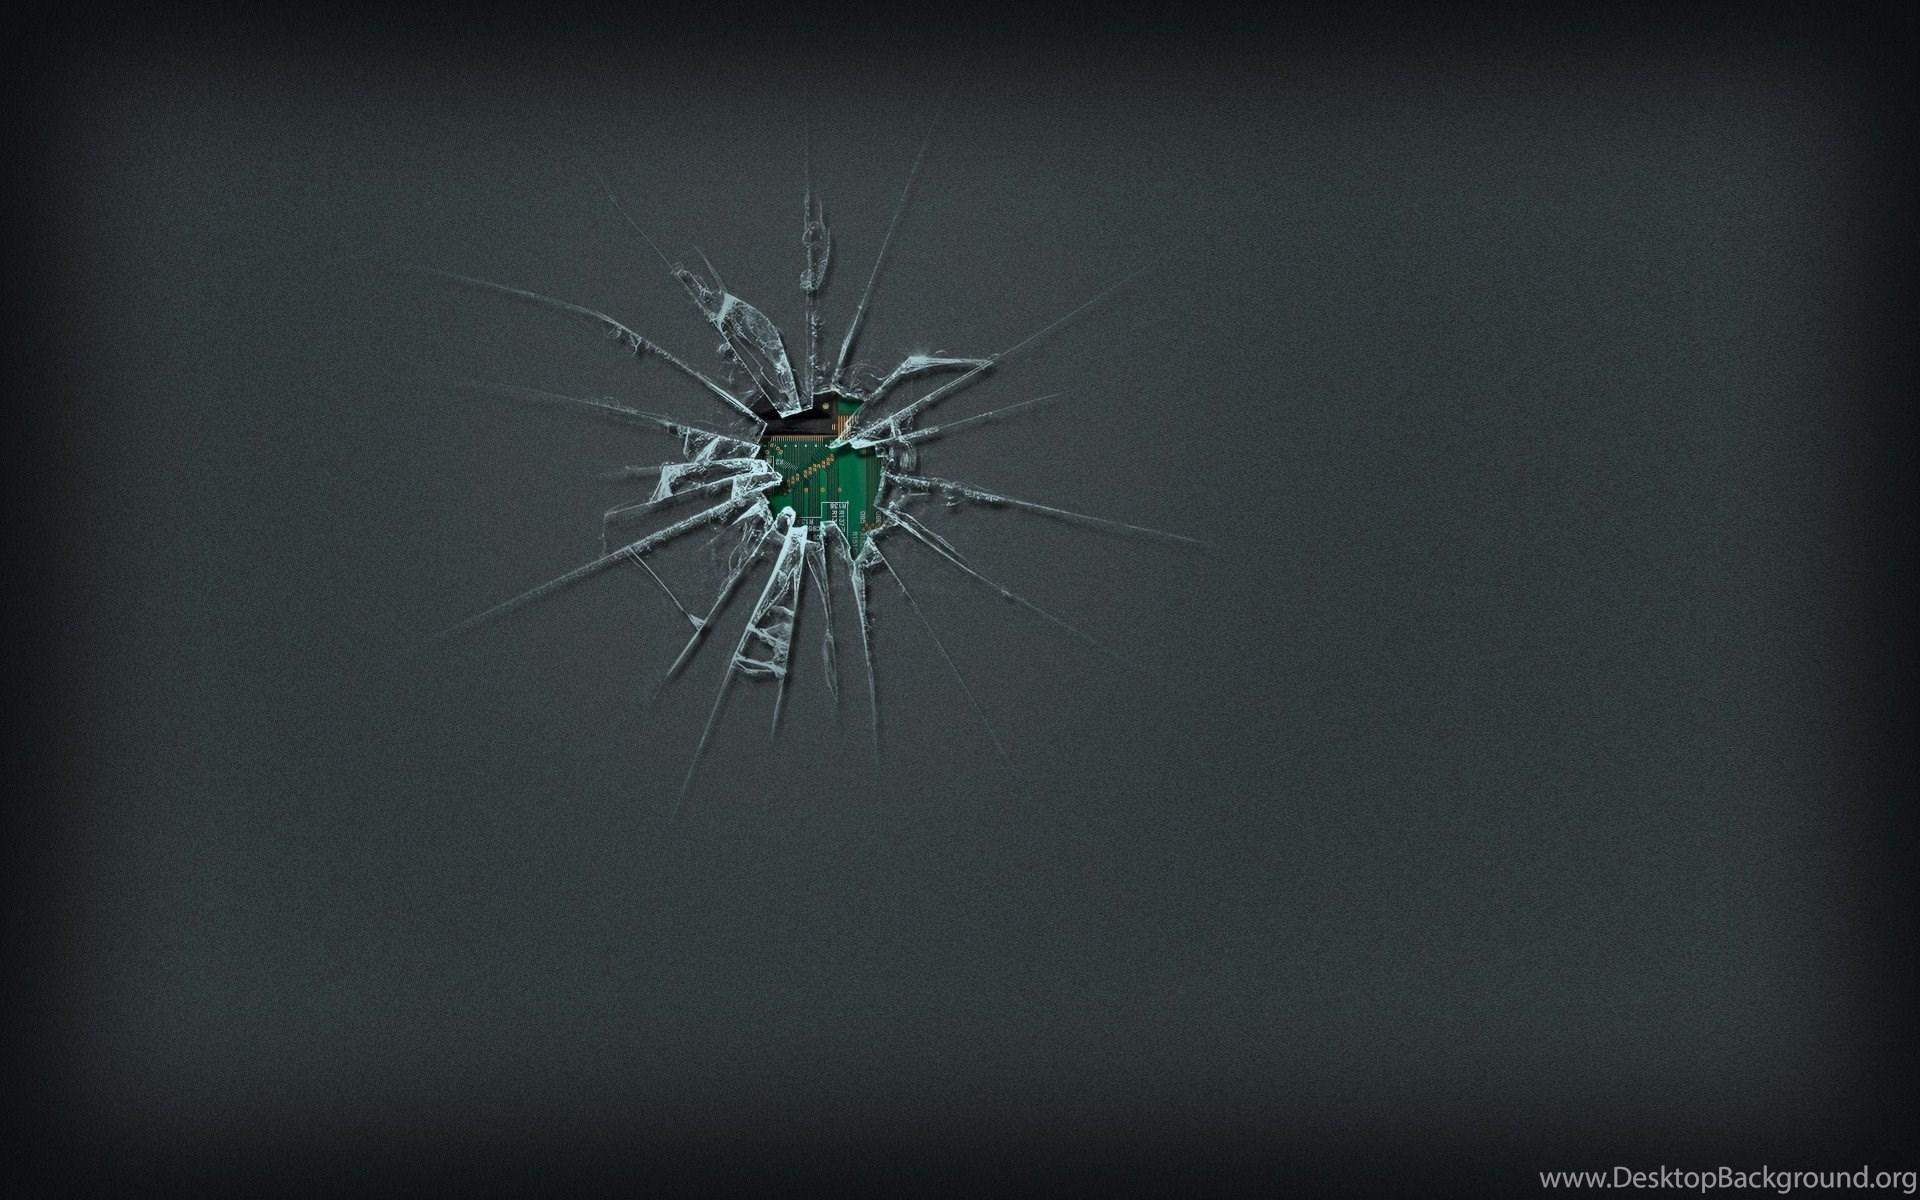 cracked screen wallpaper hd desktop